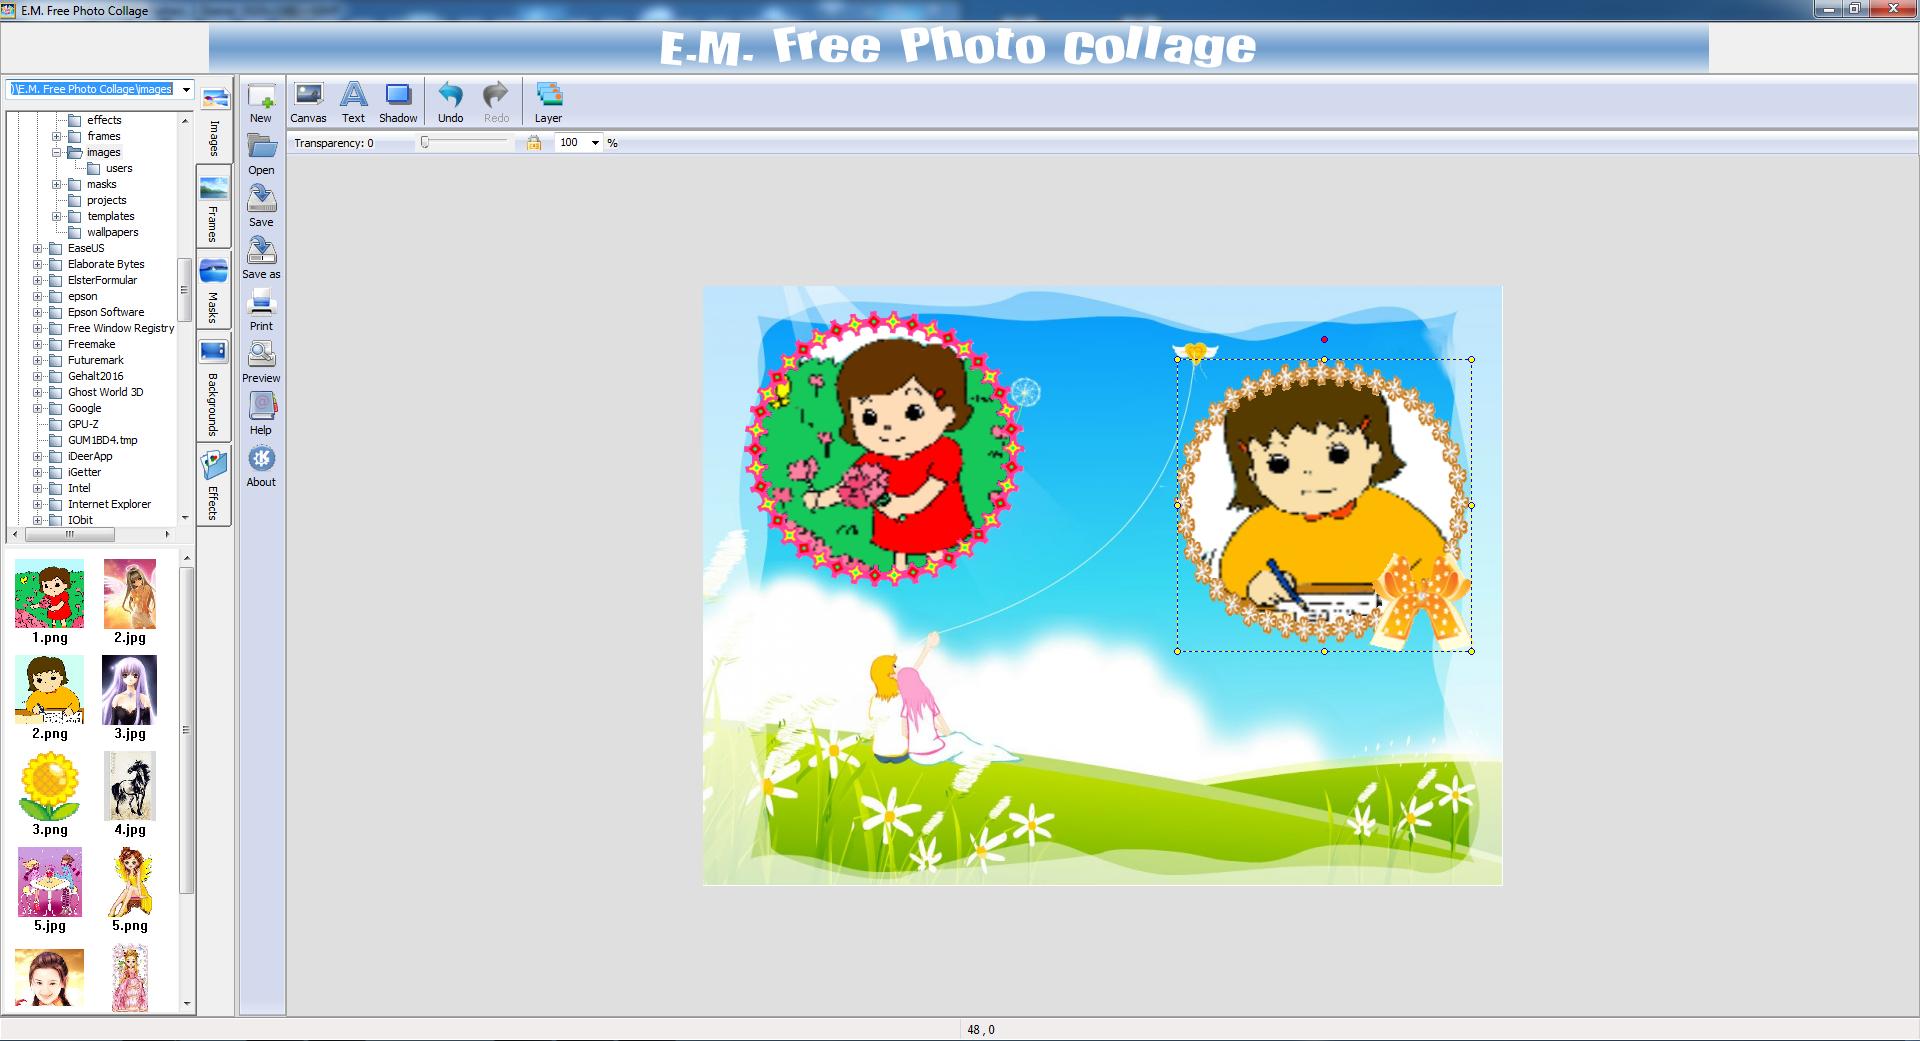 E.M. Free Photo Collage Download kostenlos - GIGA